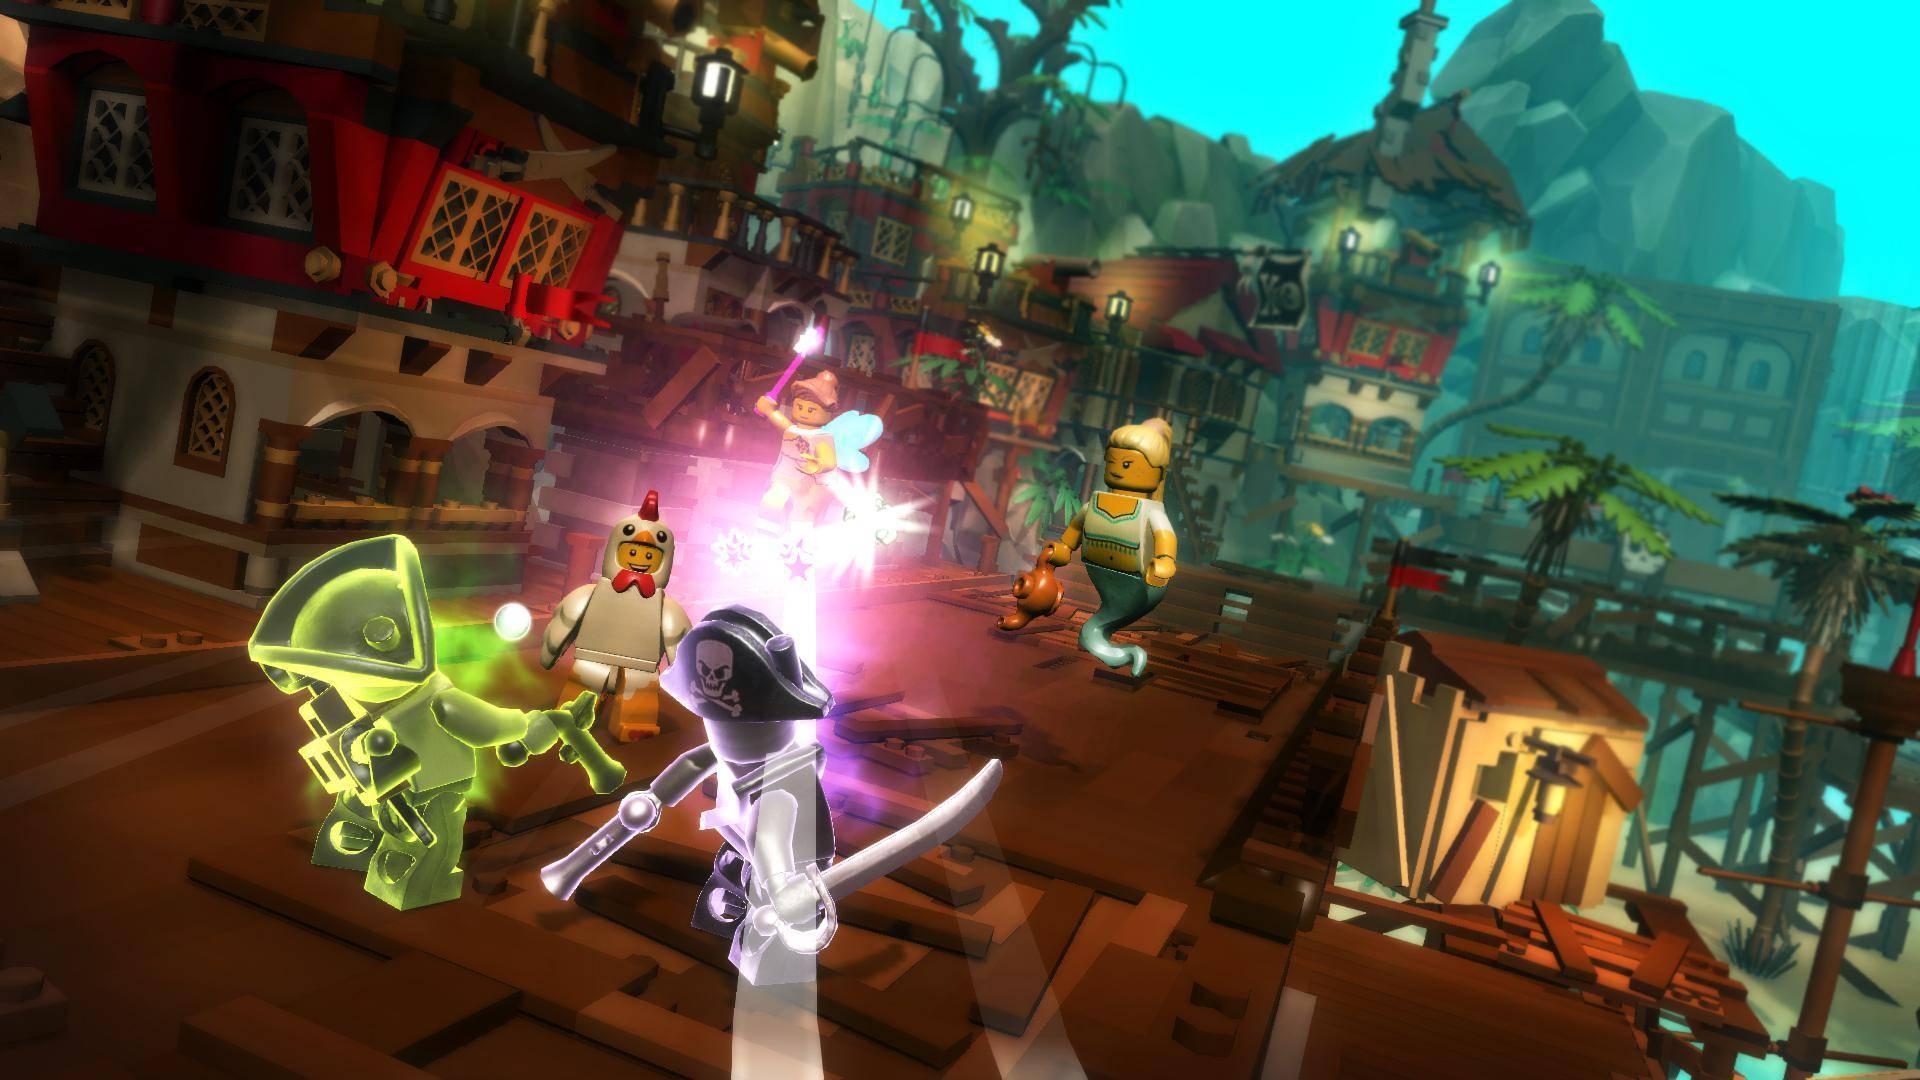 Block world games online free